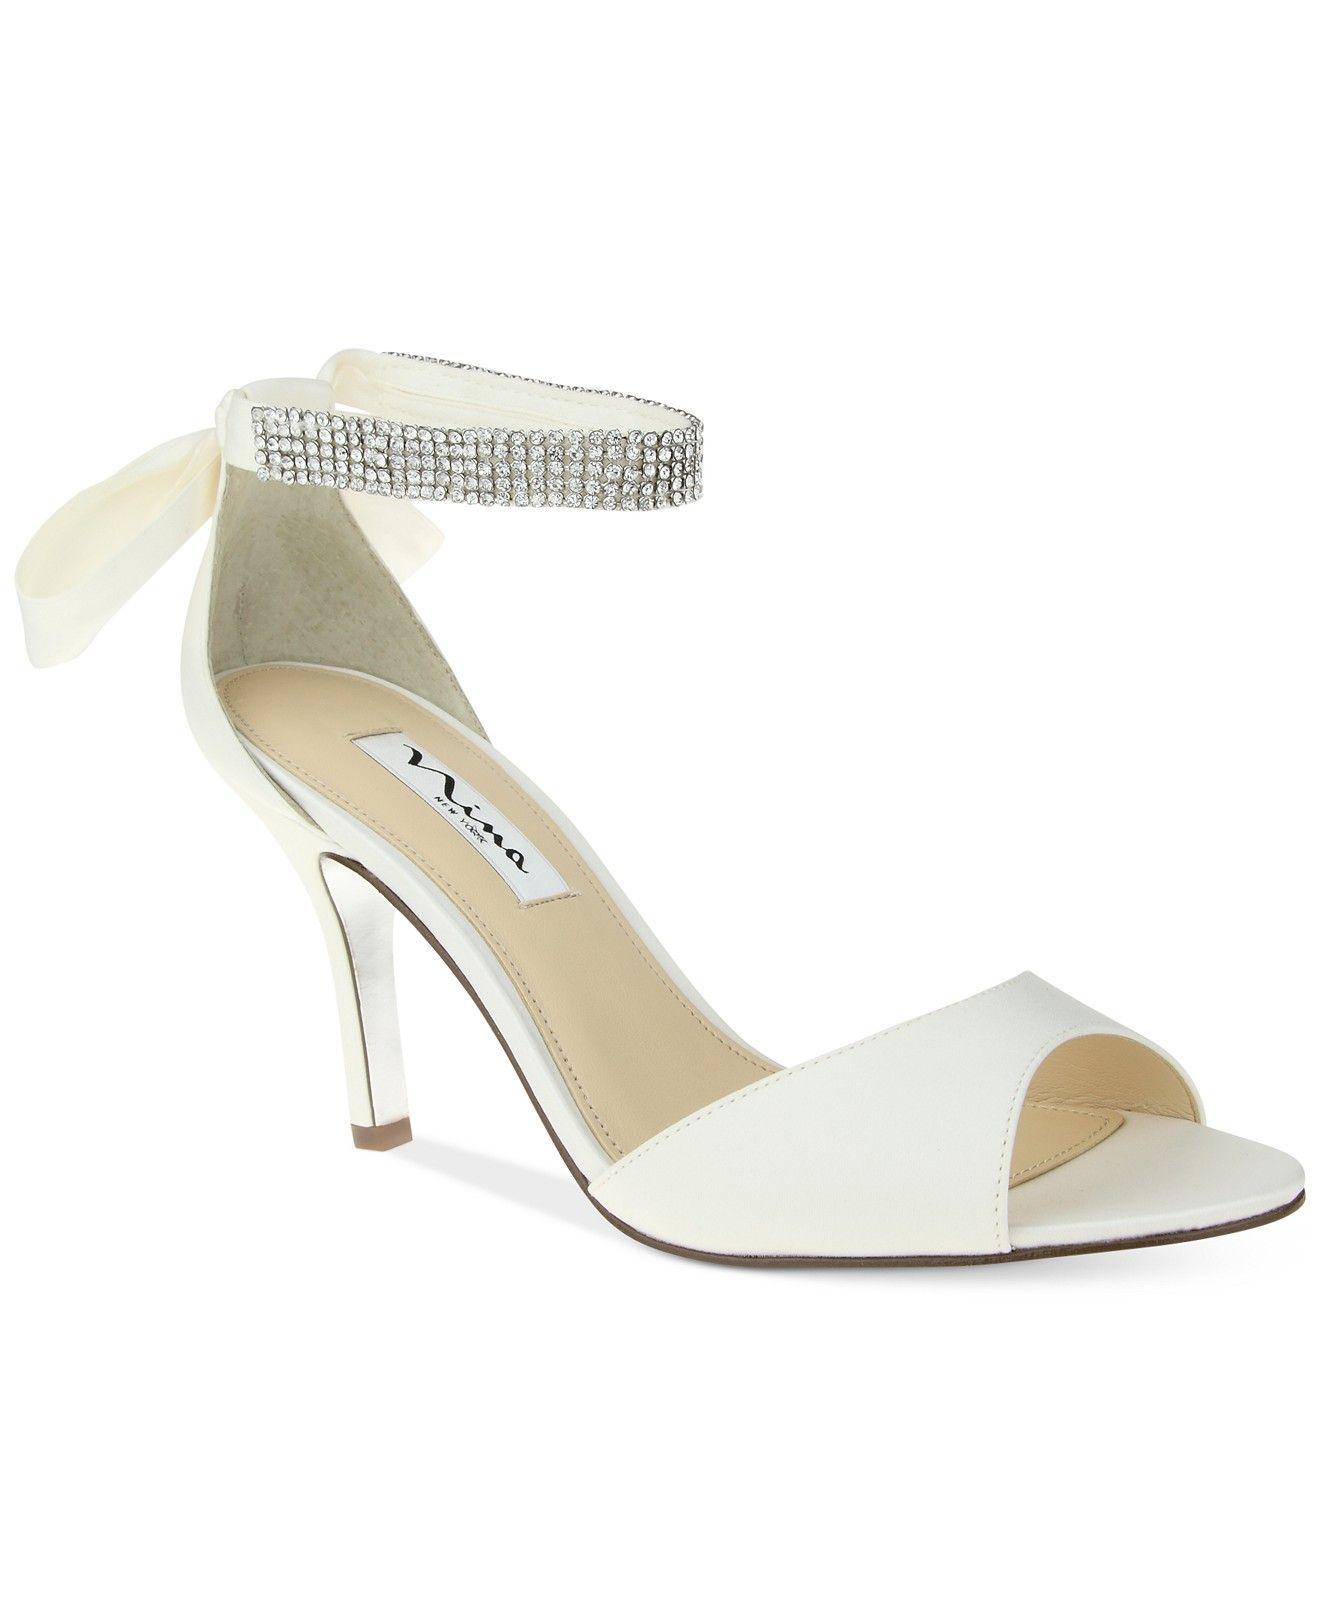 2b3272f60c7 Nina vinnie two piece evening sandals evening bridal shoes macys jpg  1320x1616 Macys wedding shoes